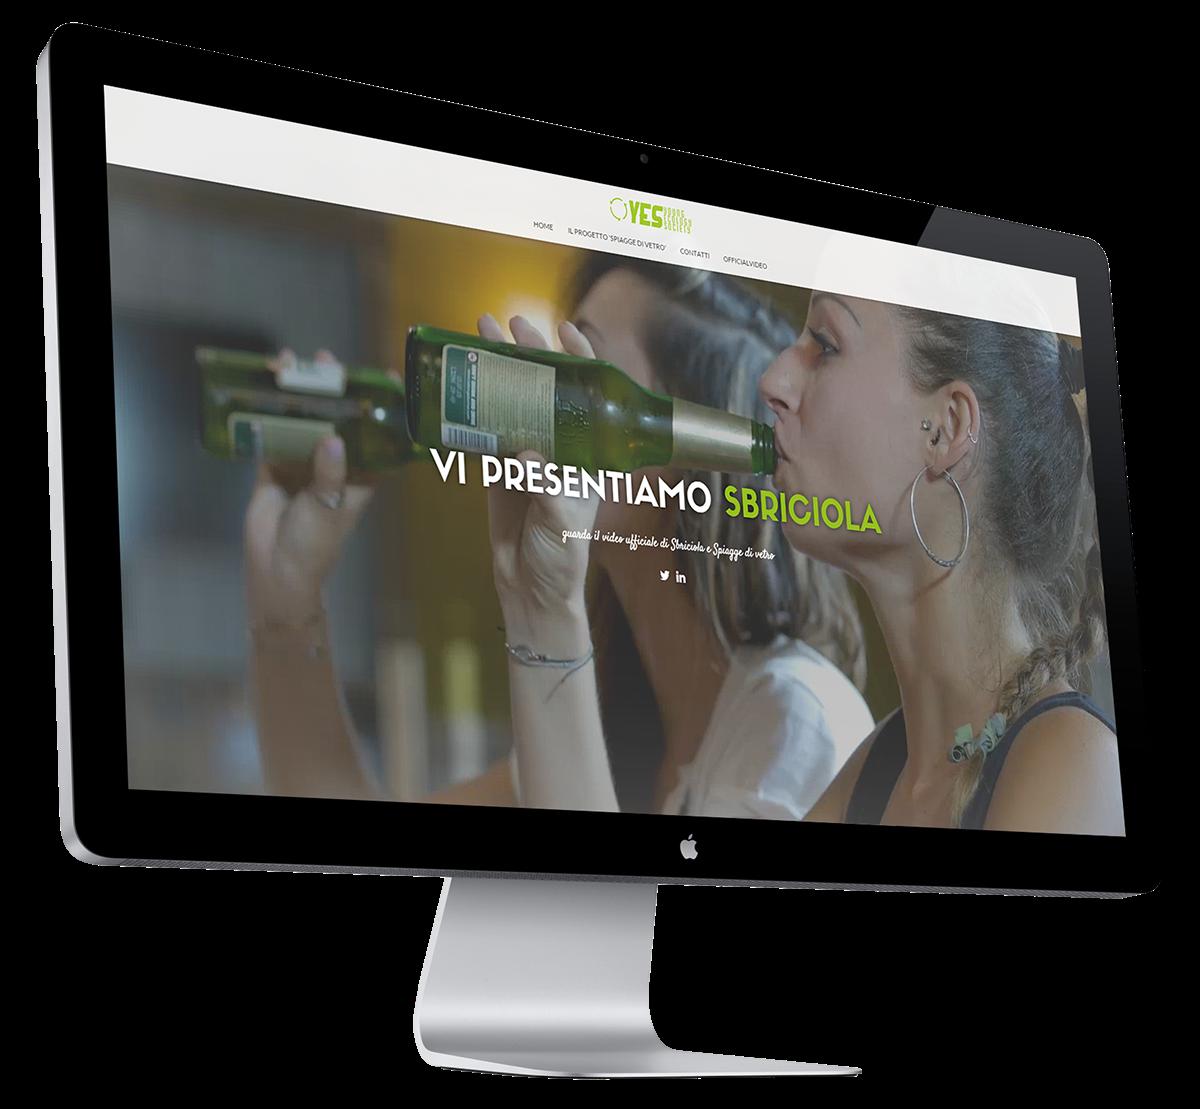 web site,design,web presence